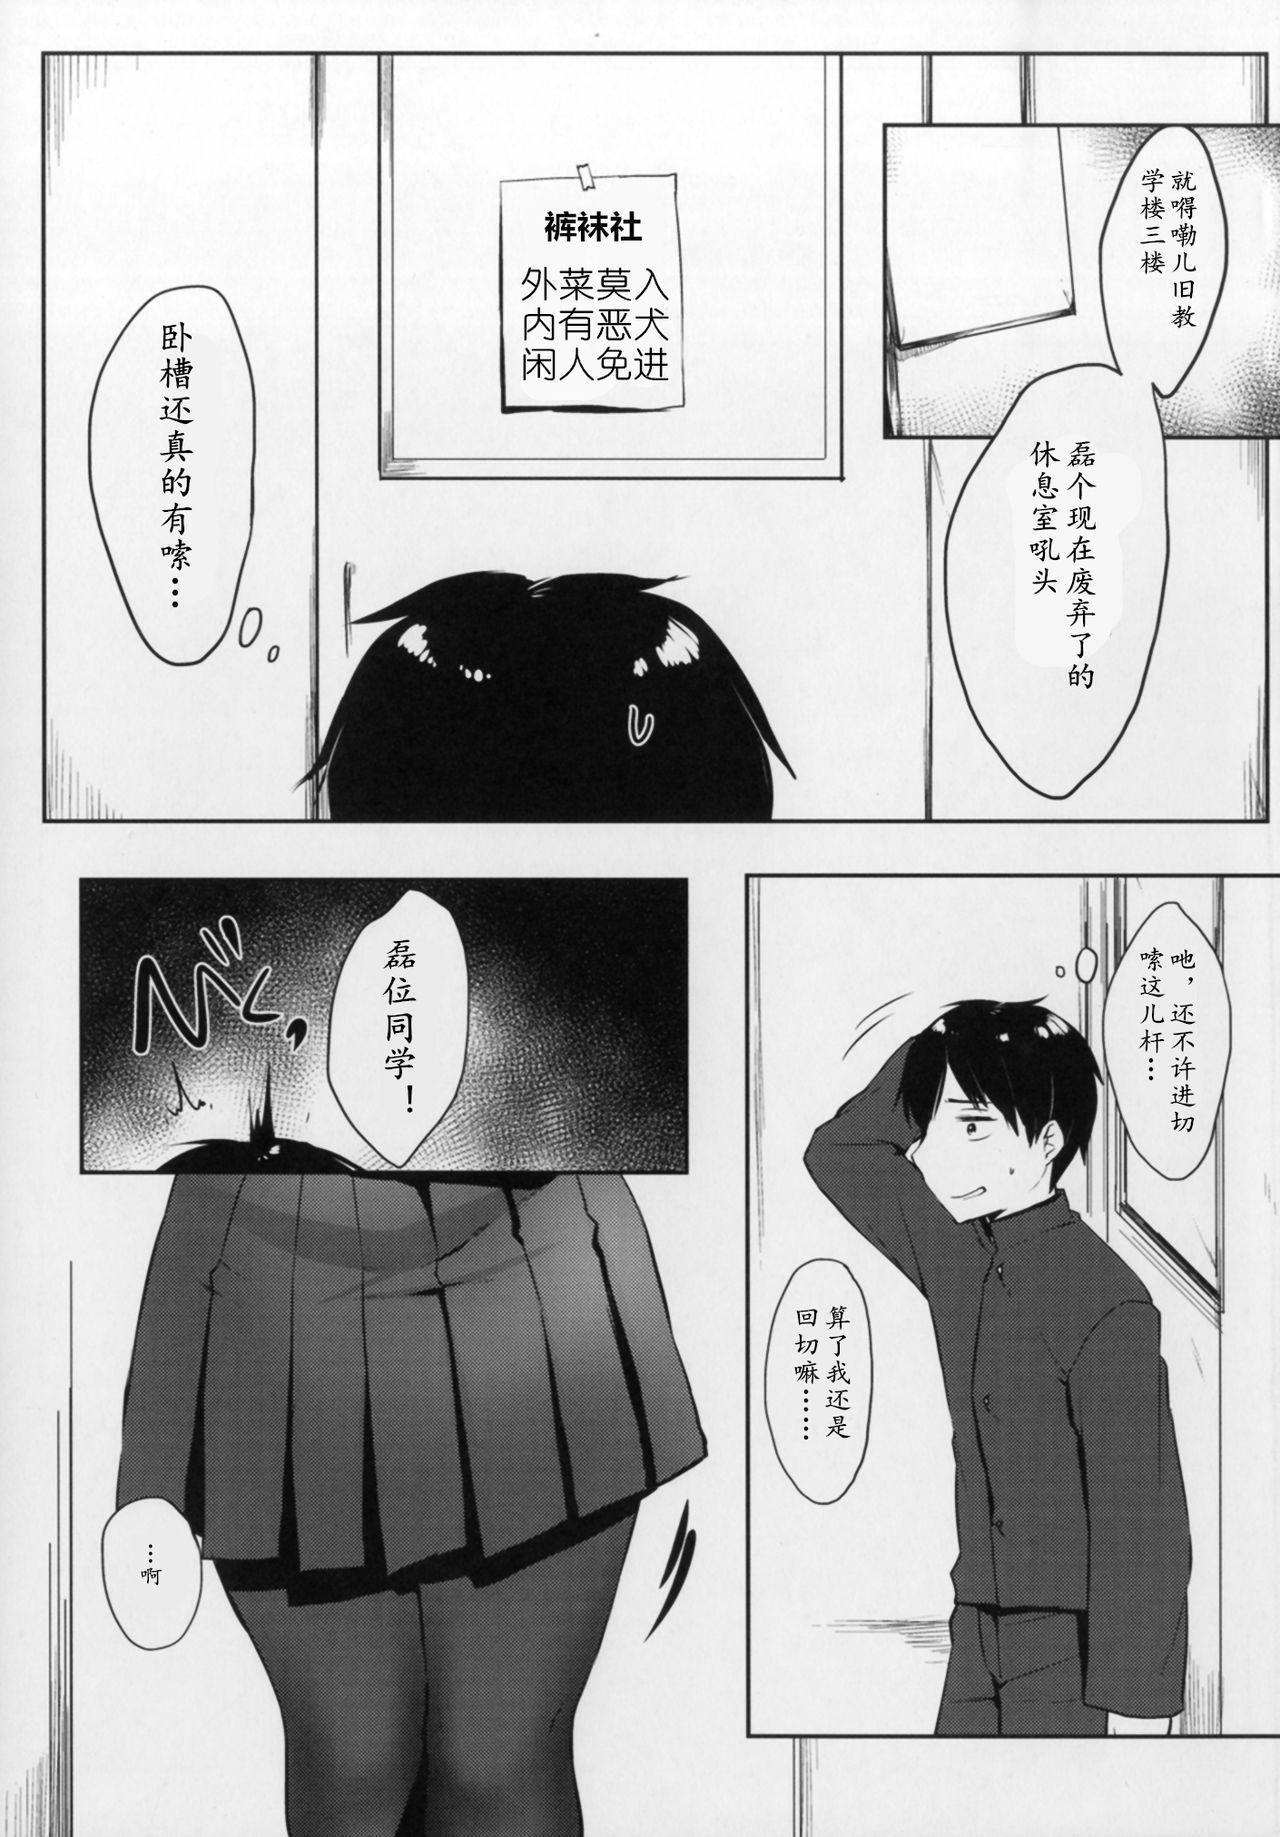 Himitsu no Tights | 秘密的黑丝 4